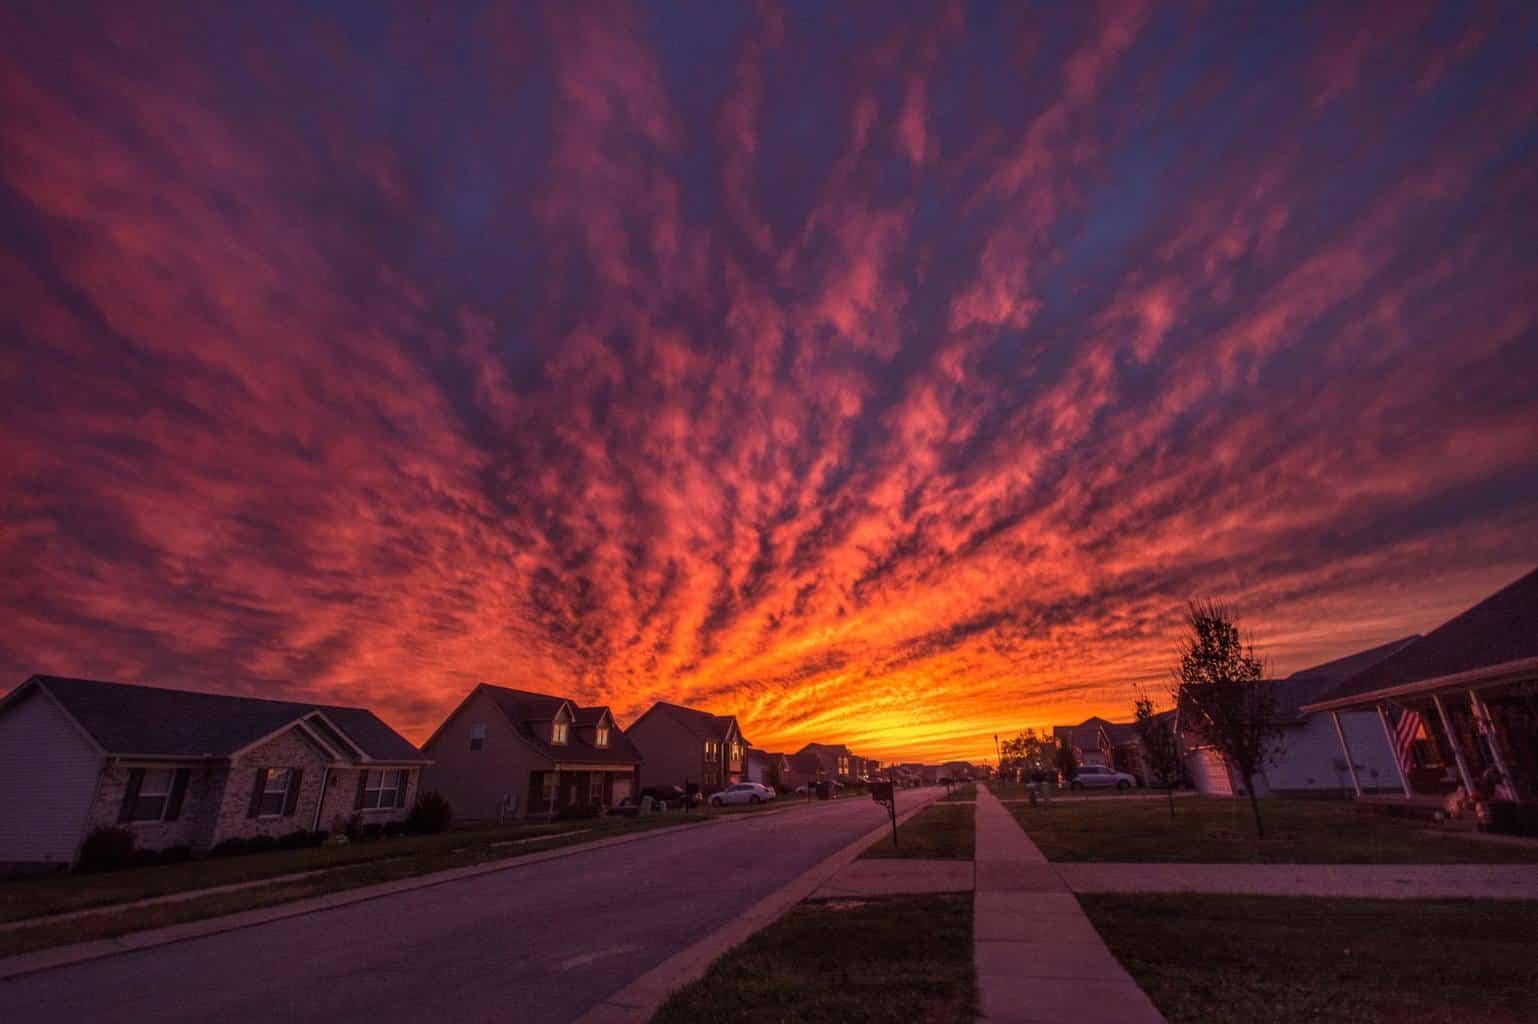 Sunset this November 1st in Mount Washington, Kentucky